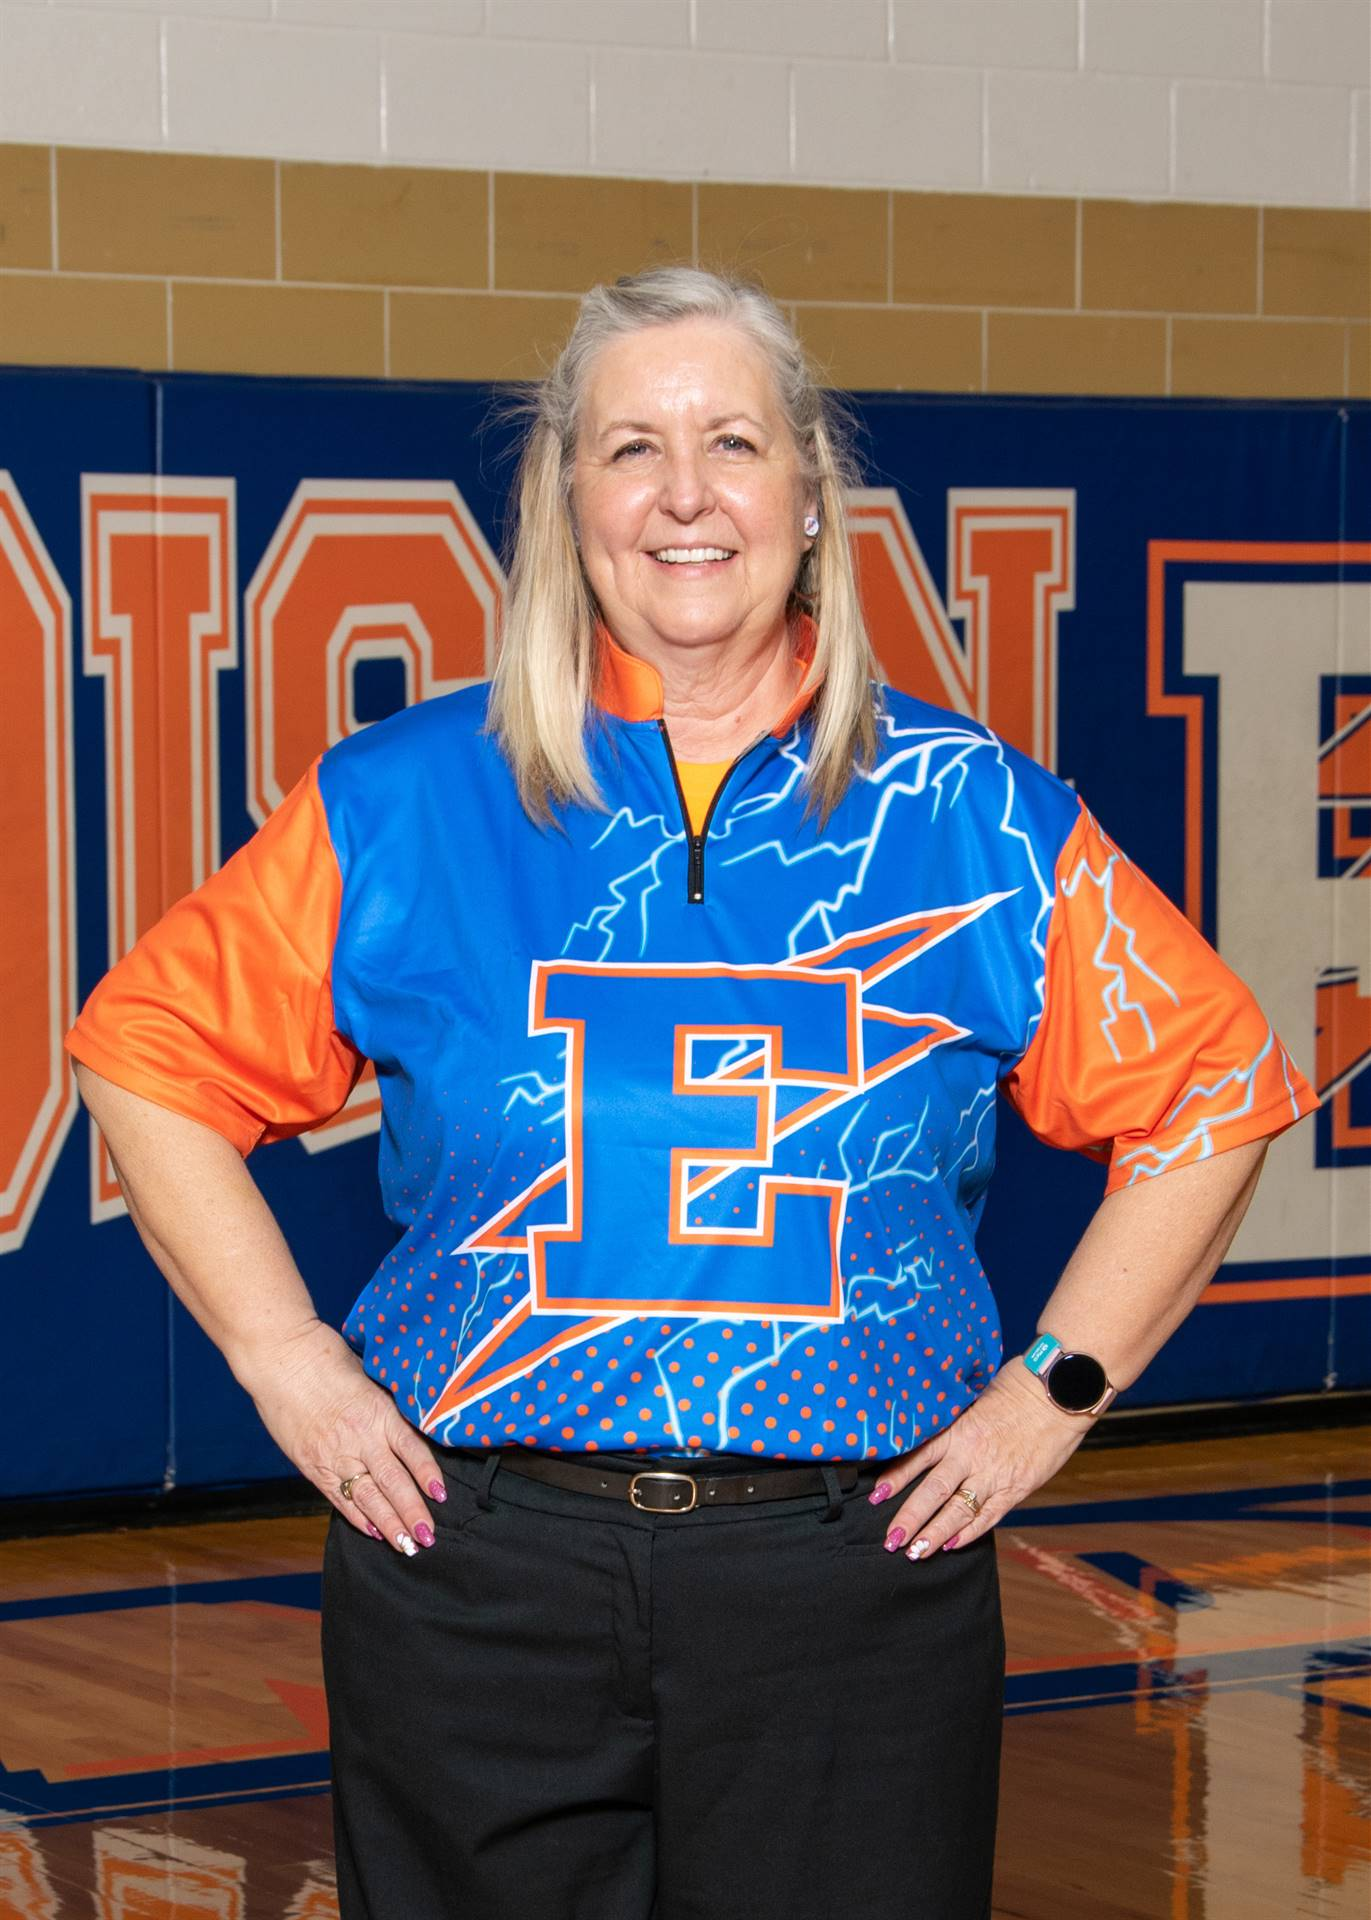 Head Girls Coach - Constance Brown